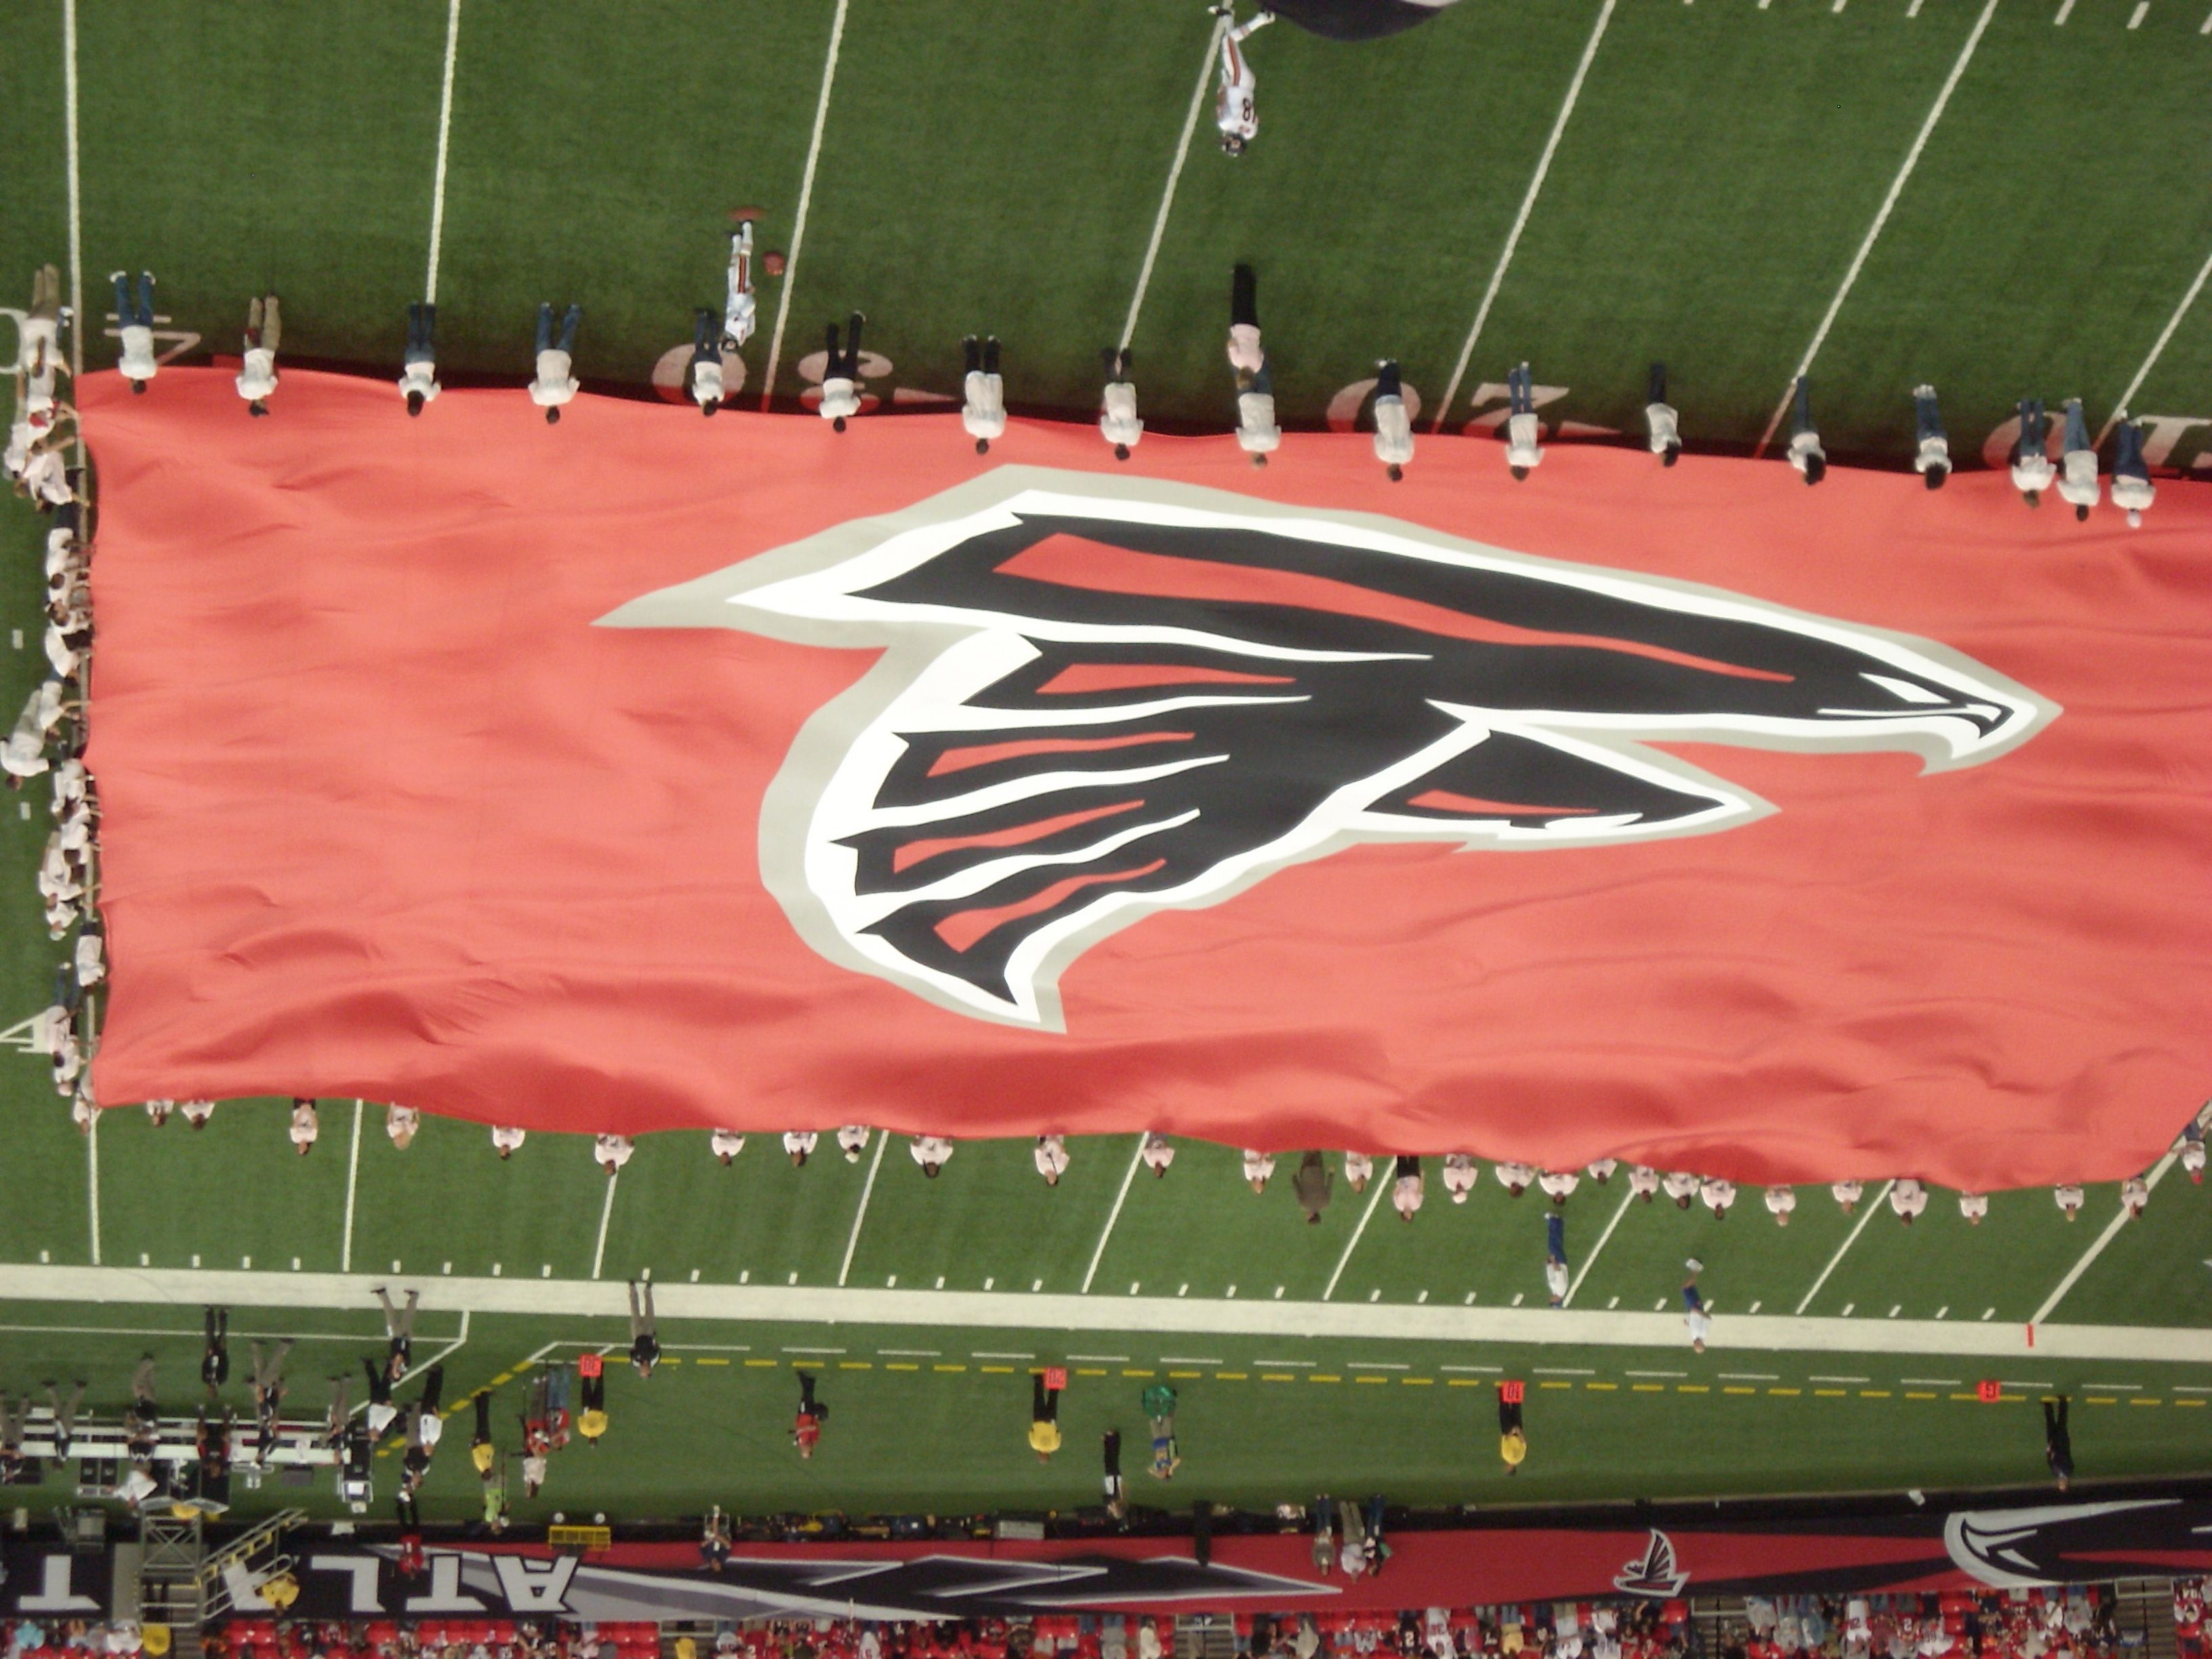 Atlanta Falcons Football Game Live With Images Atlanta Falcons Football Atlanta Falcons Logo Atlanta Falcons Memes